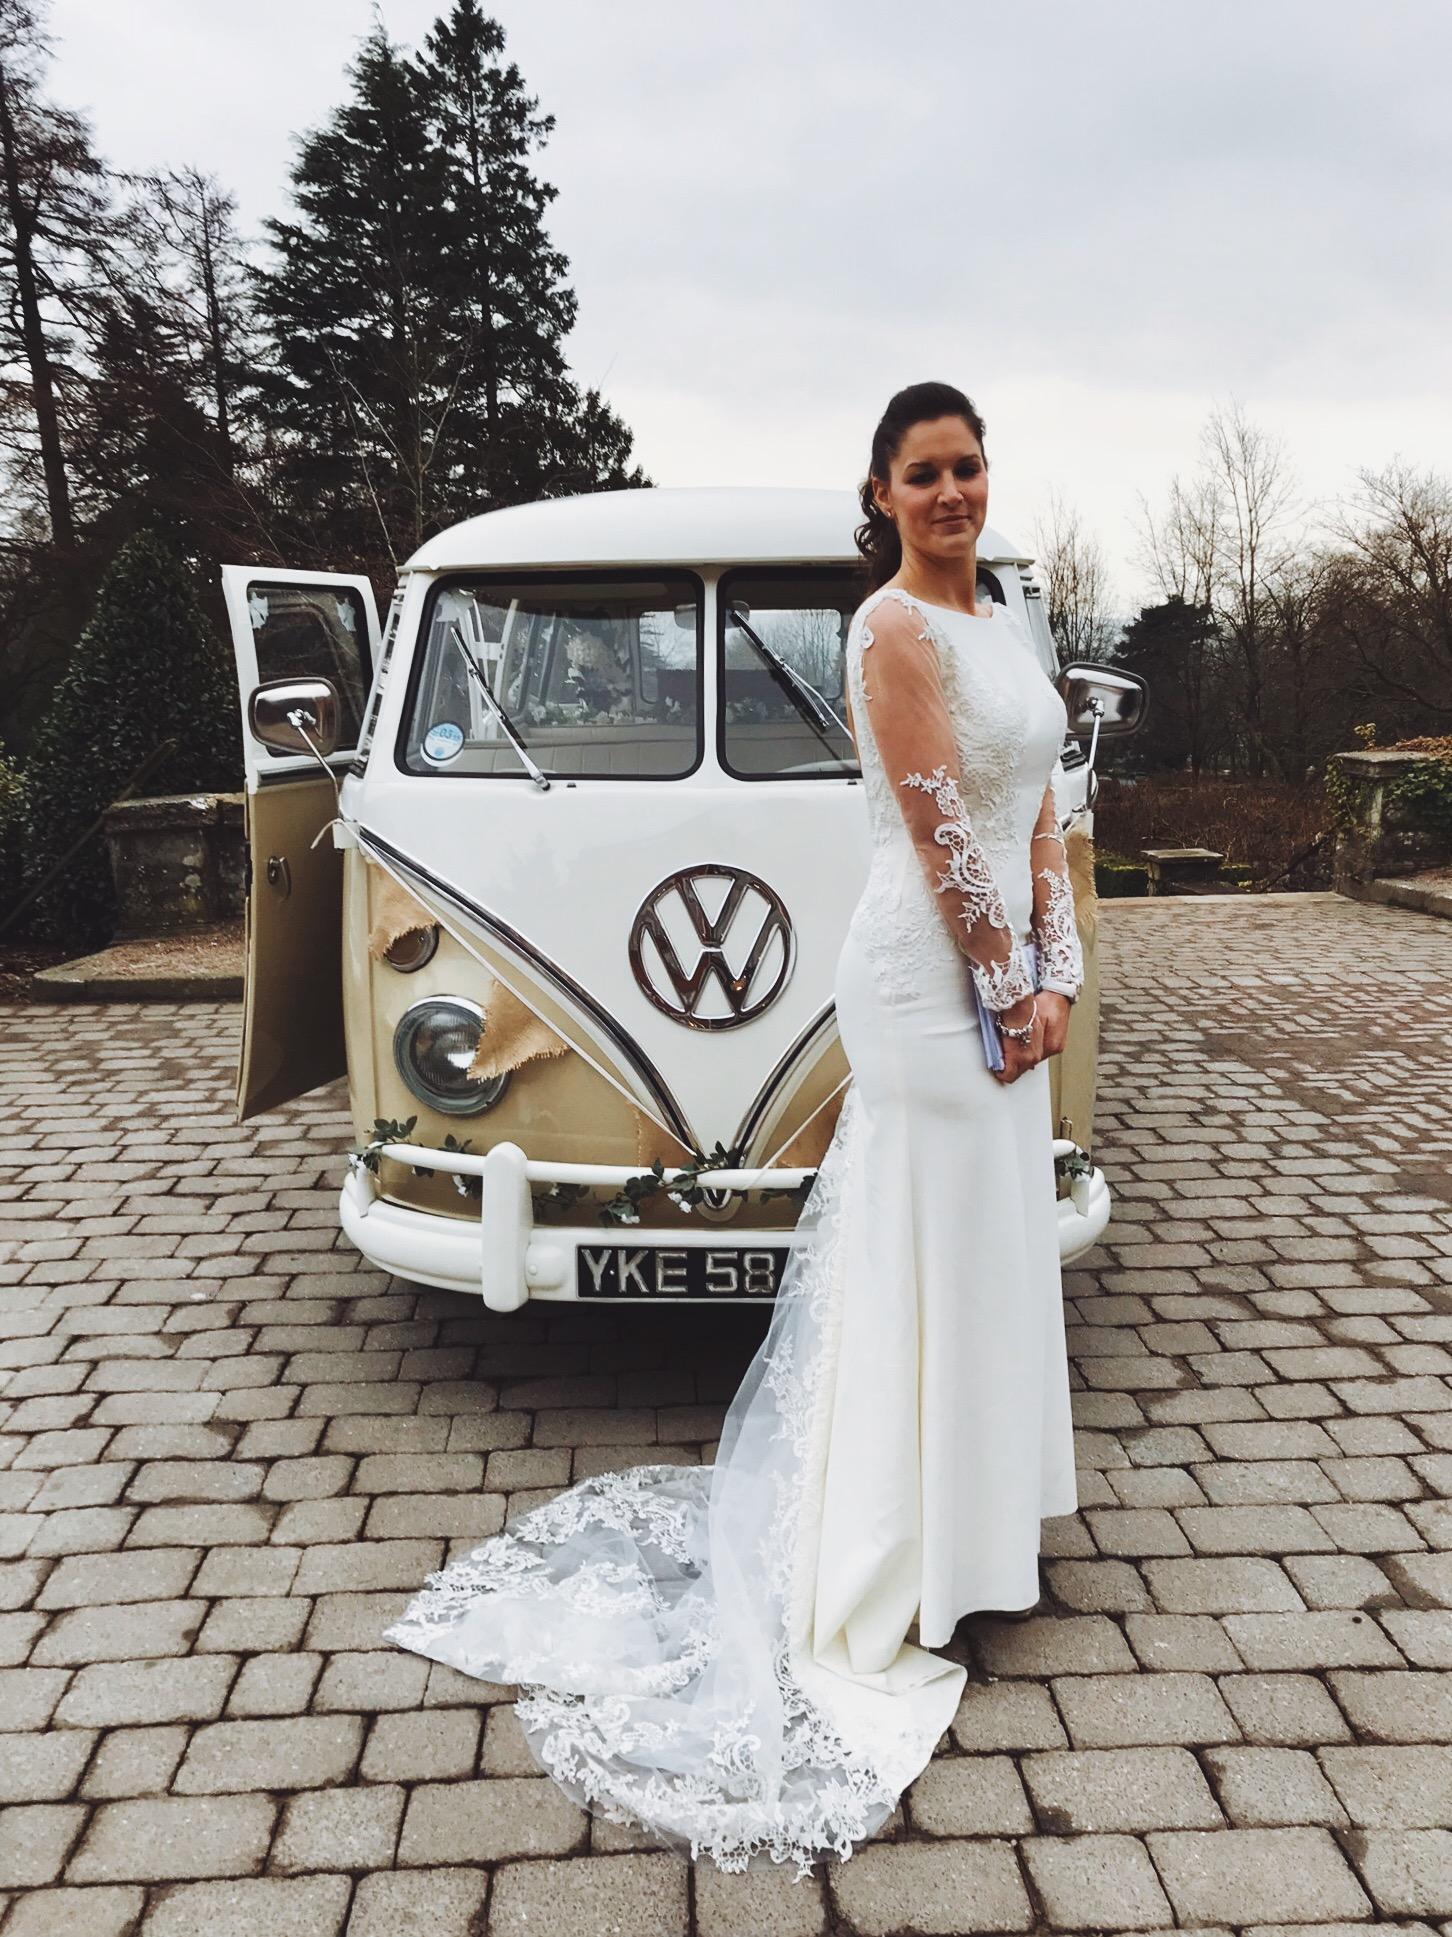 bride-in-front-of-vw-campervan-cream.jpg